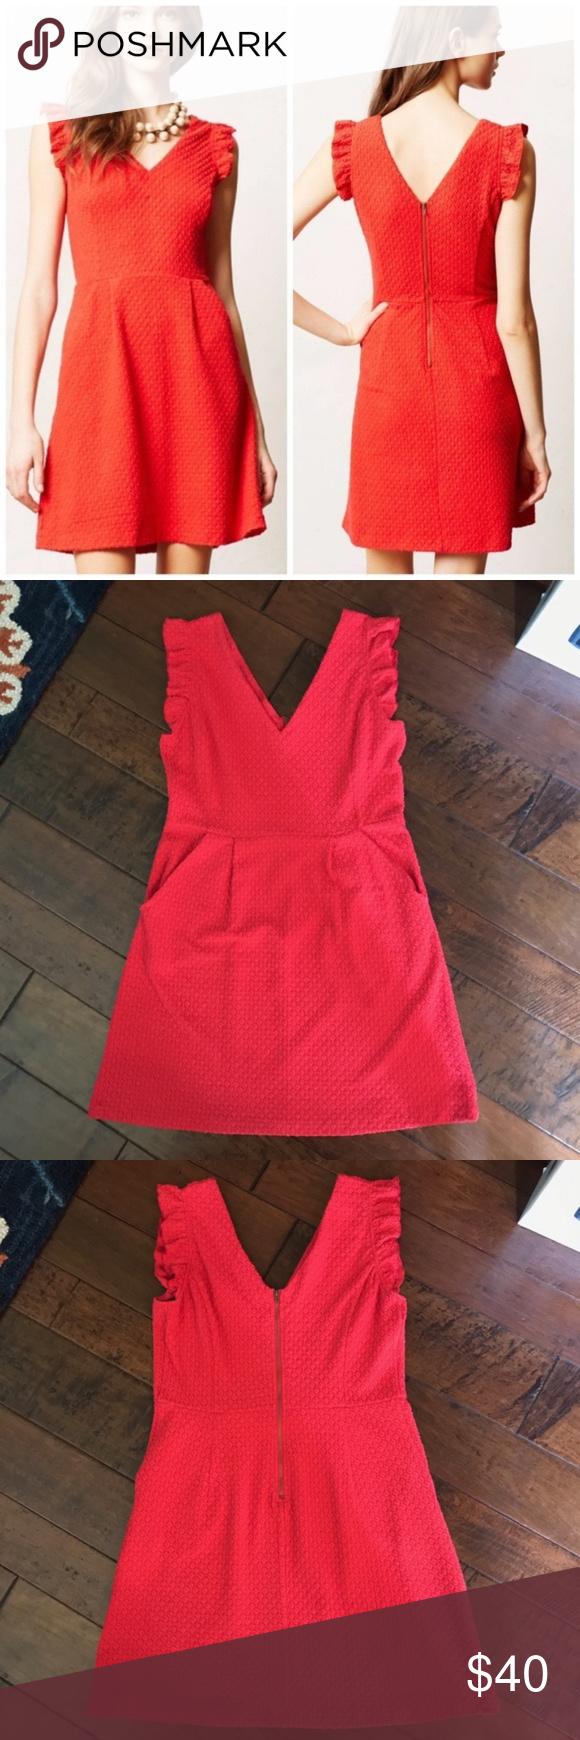 Anthropologie Tabitha Teahouse Dress Size 12 Red Clothes Design Red Colour Dress Dresses [ 1740 x 580 Pixel ]